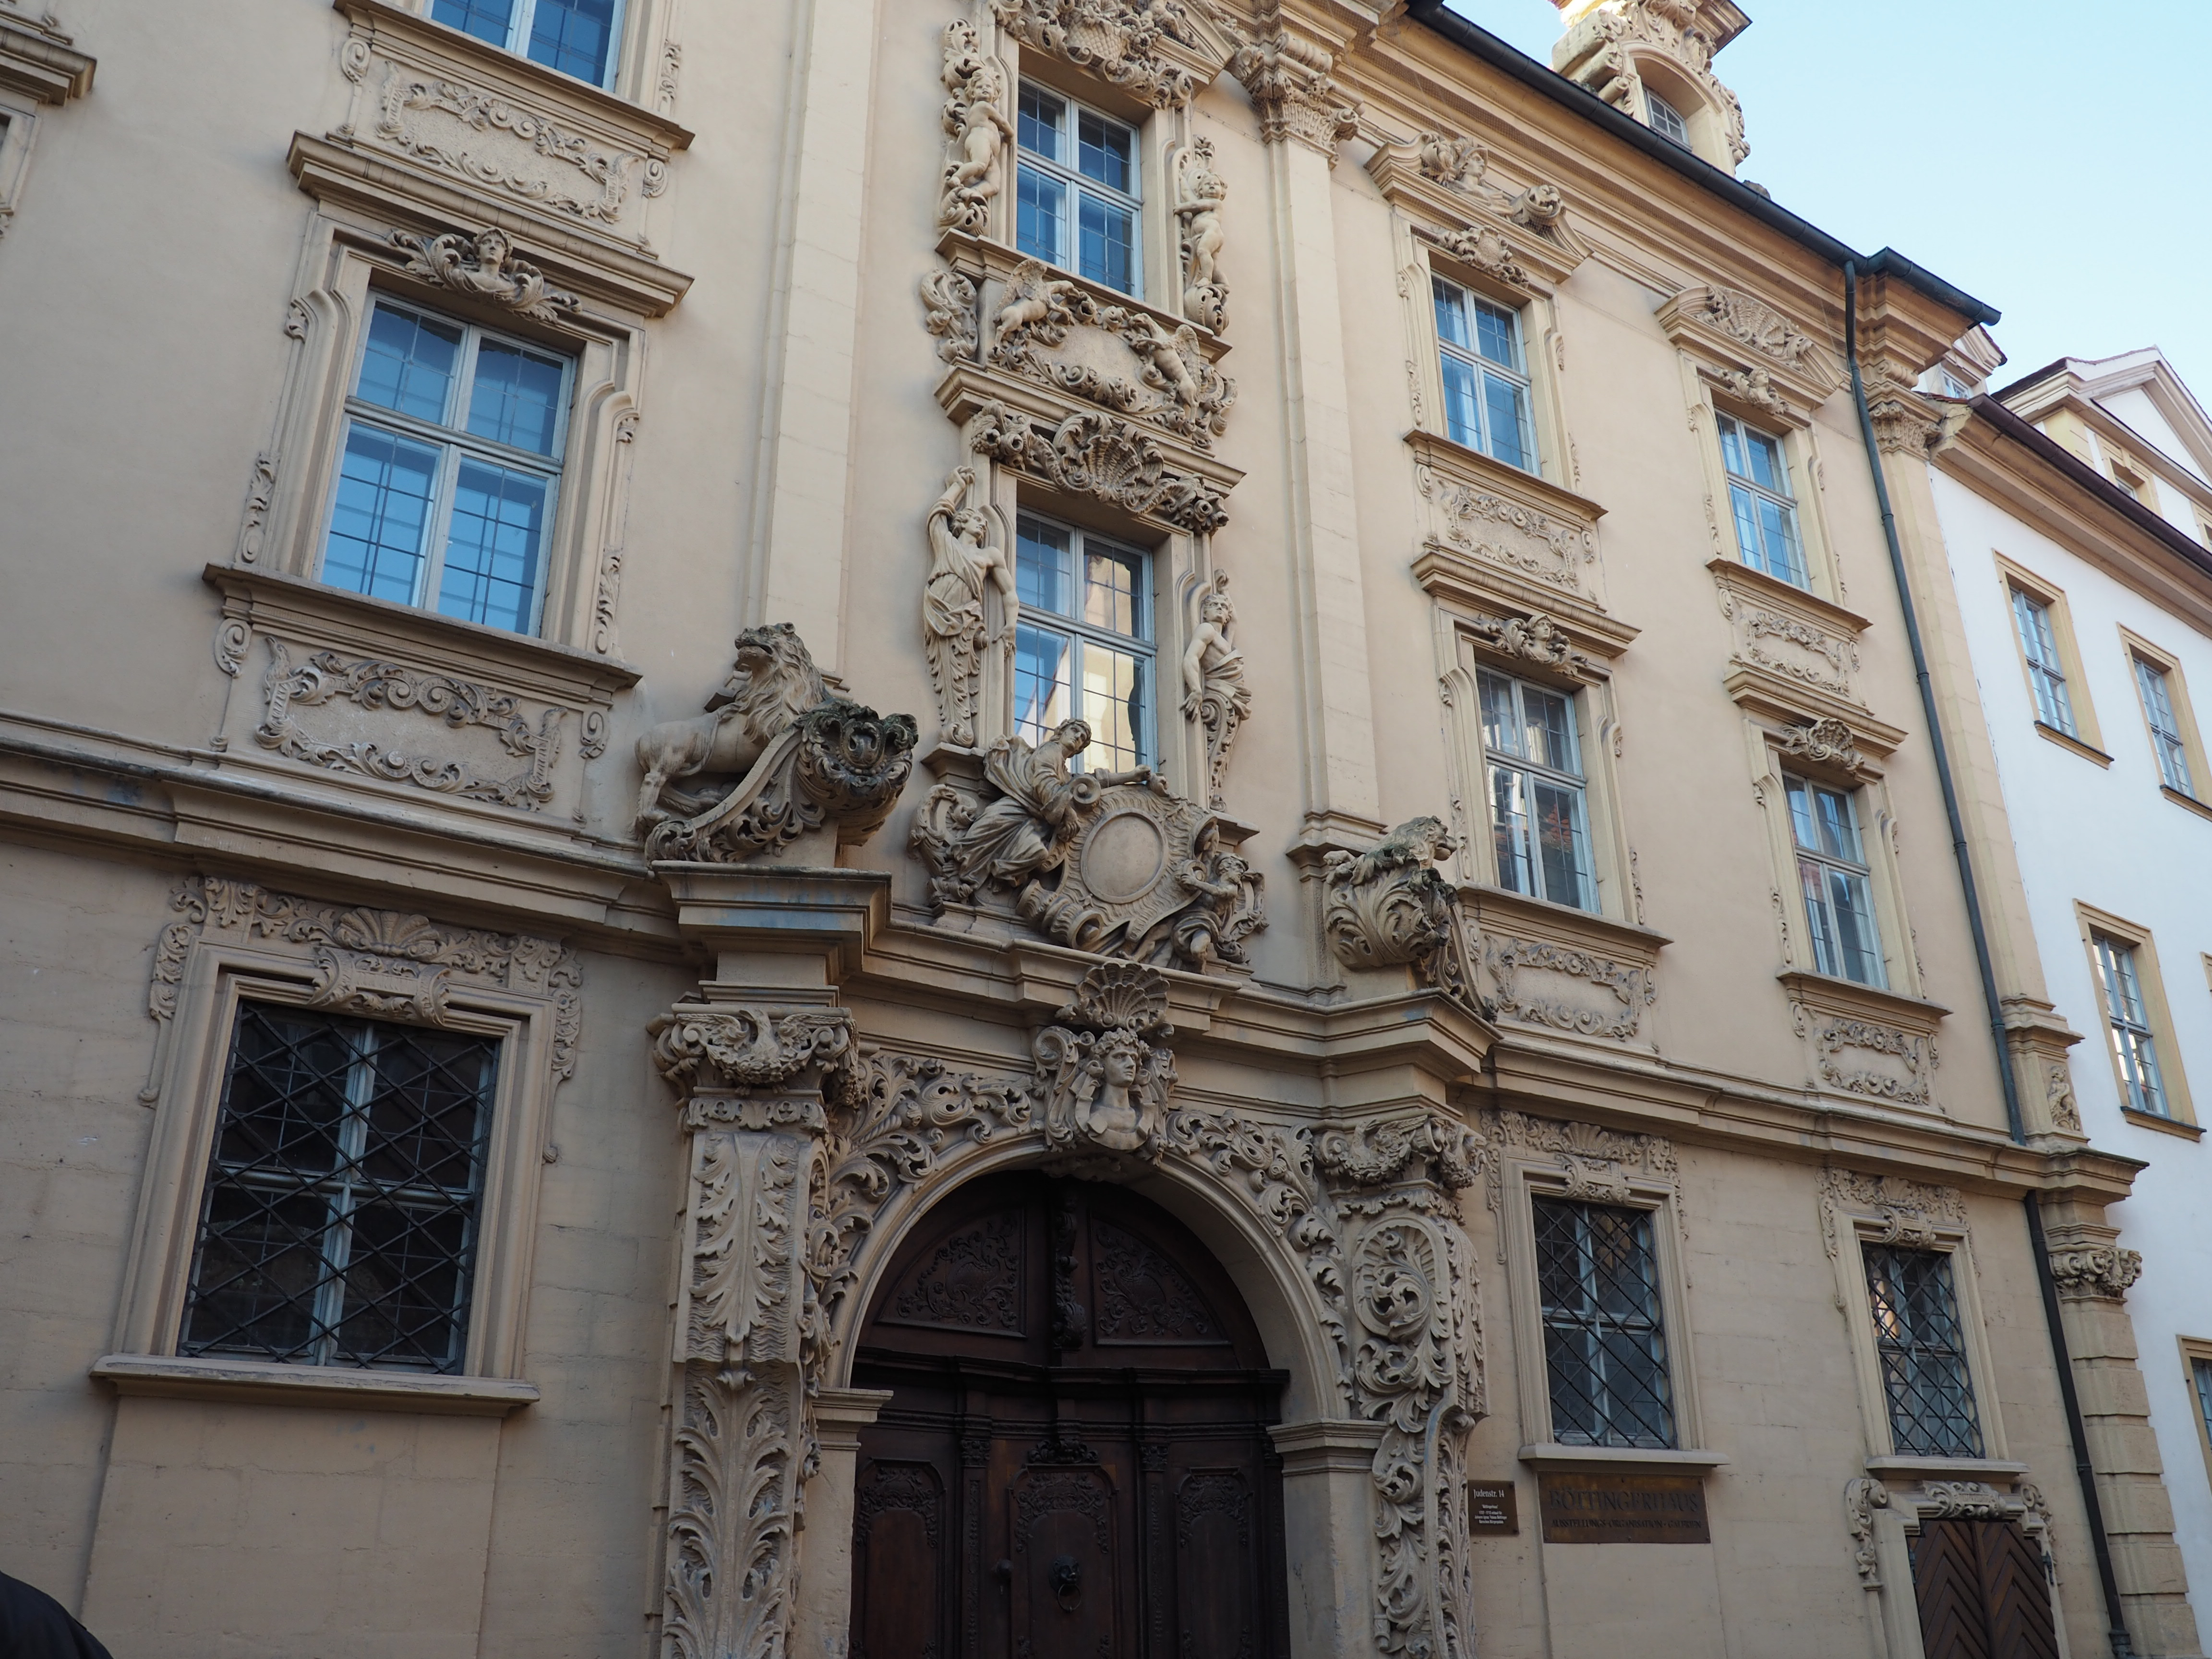 Reich verzierte Fassade des Böttingerhauses in Bamberg